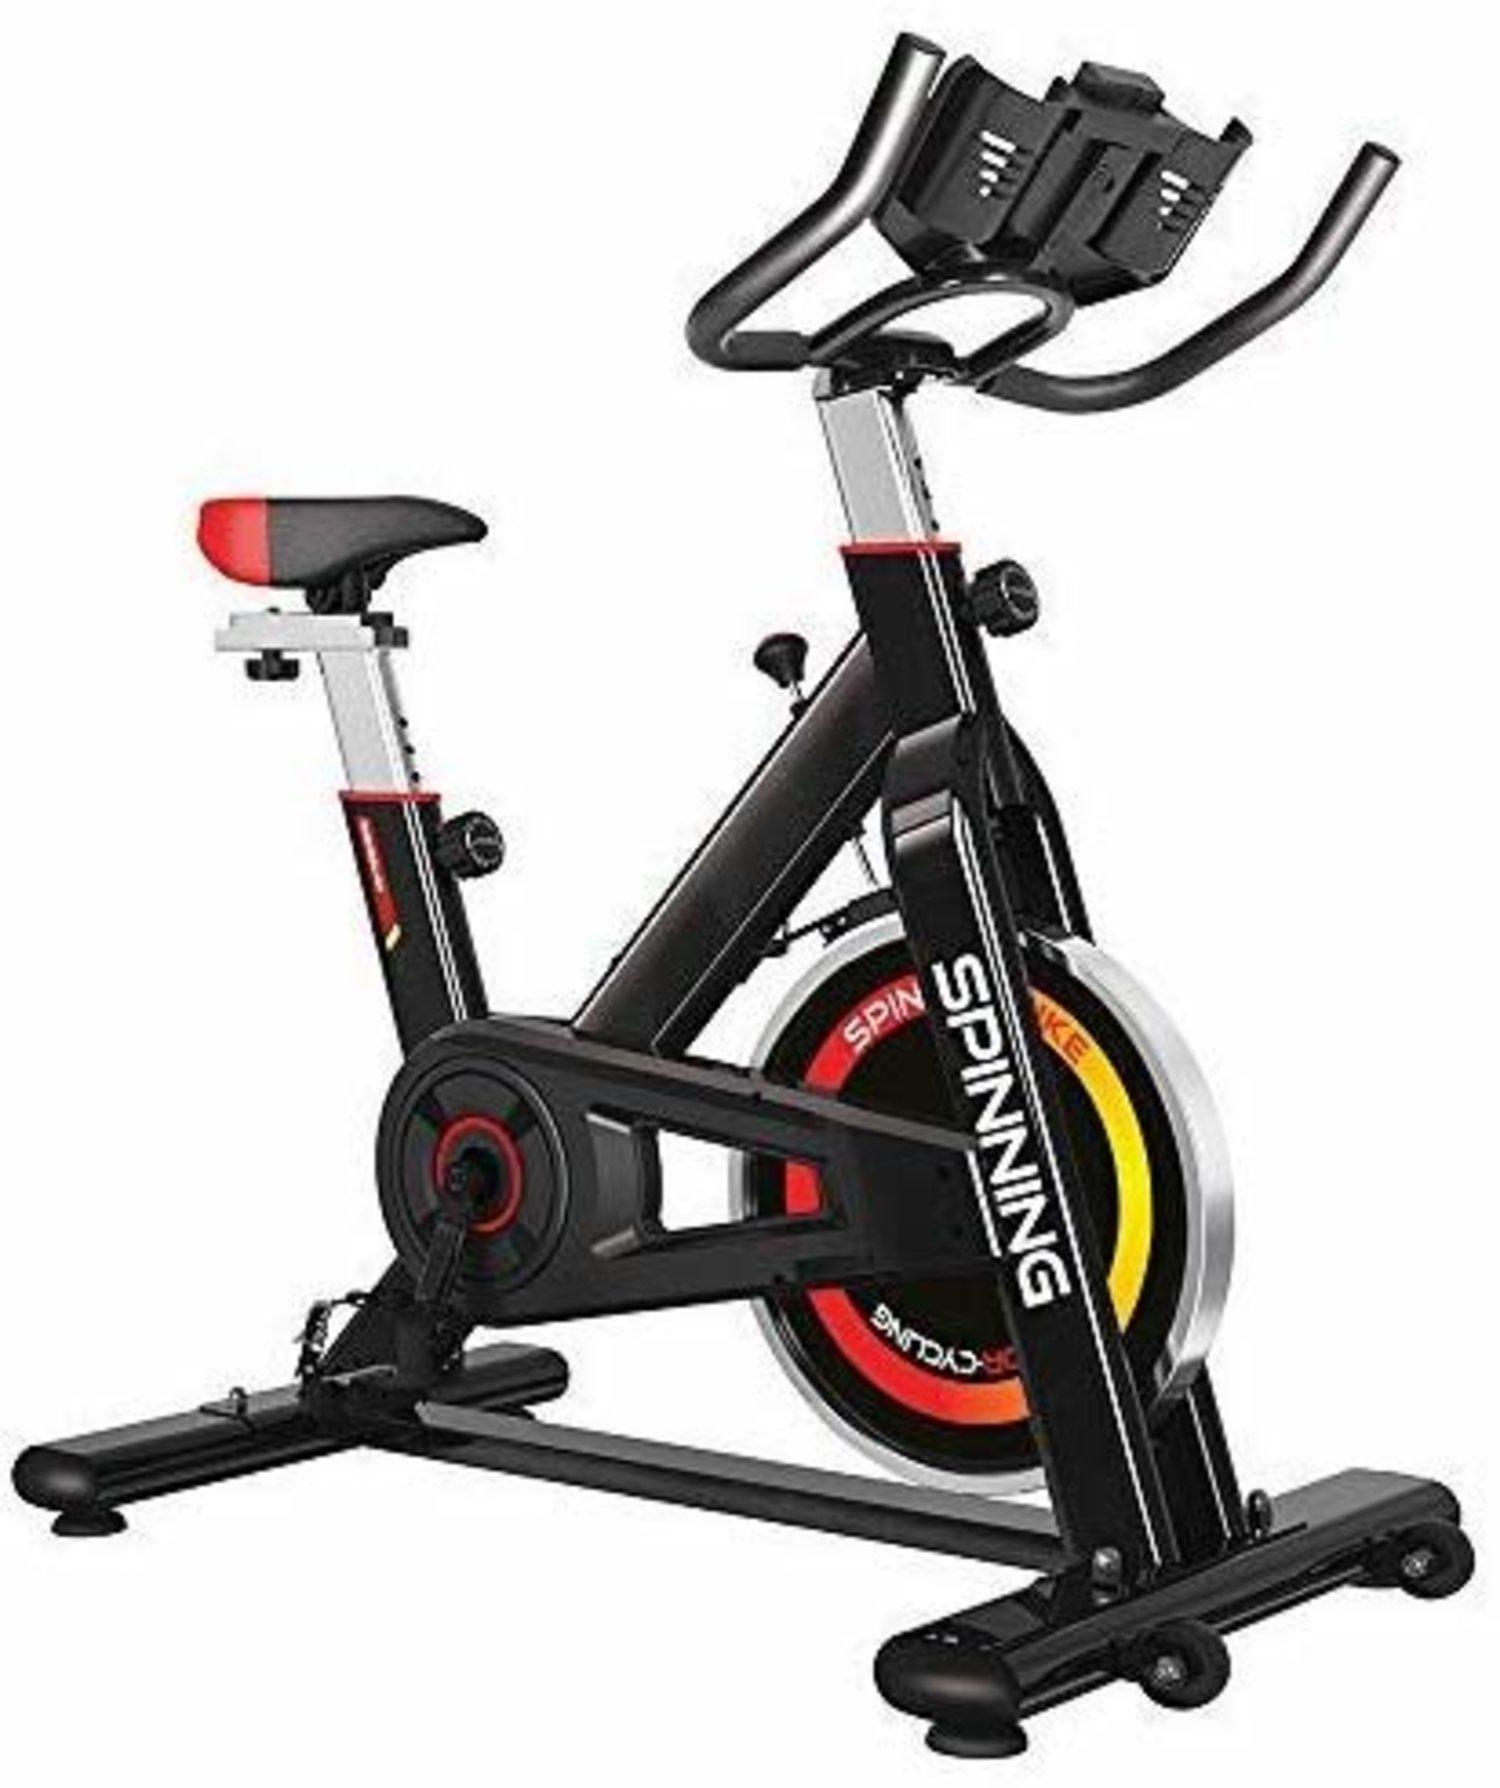 Bicicleta estática Grindilux, perfecta para hacer Spining dentro de casa.